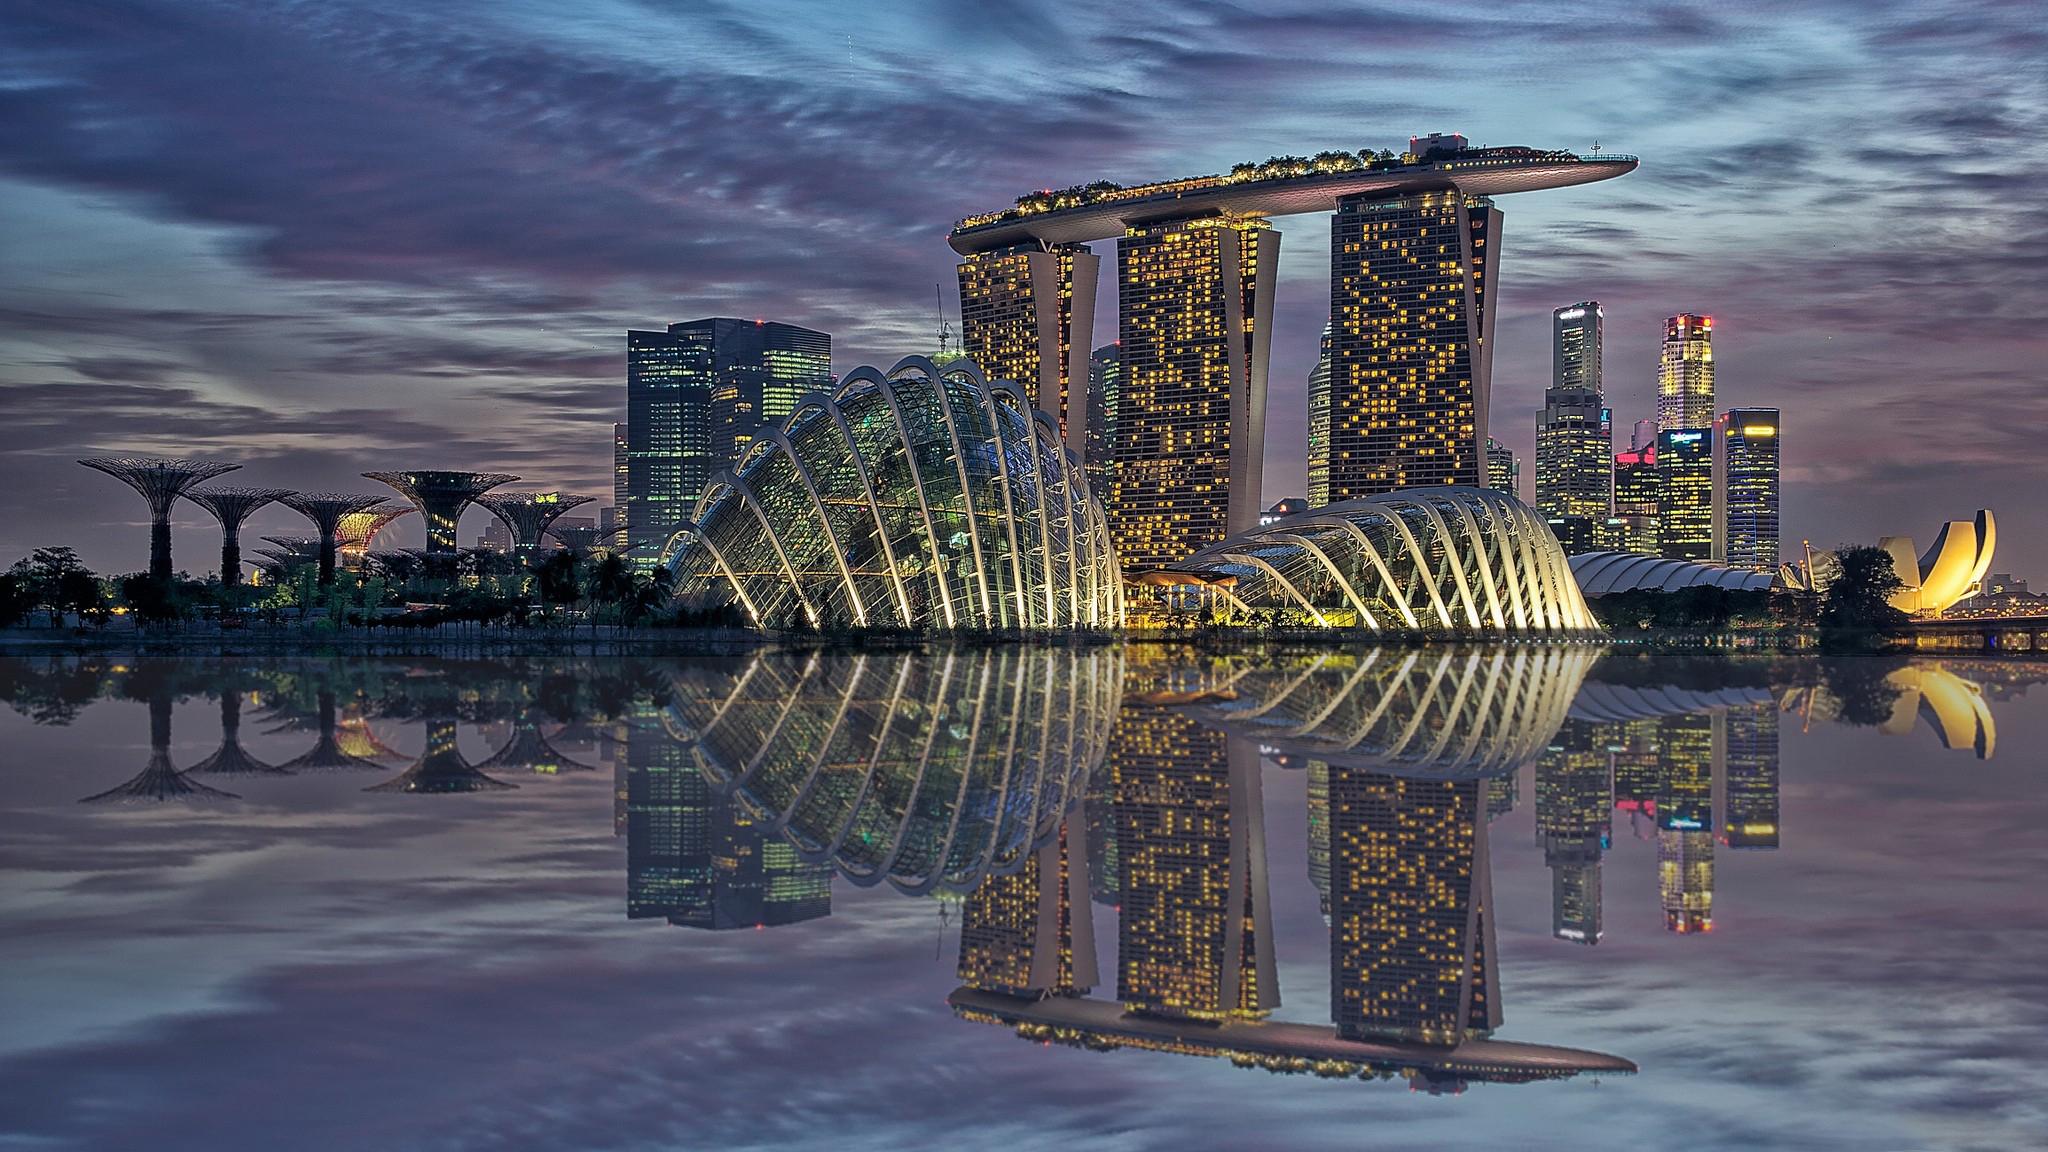 страны архитектура Сингапур country architecture Singapore анонимно